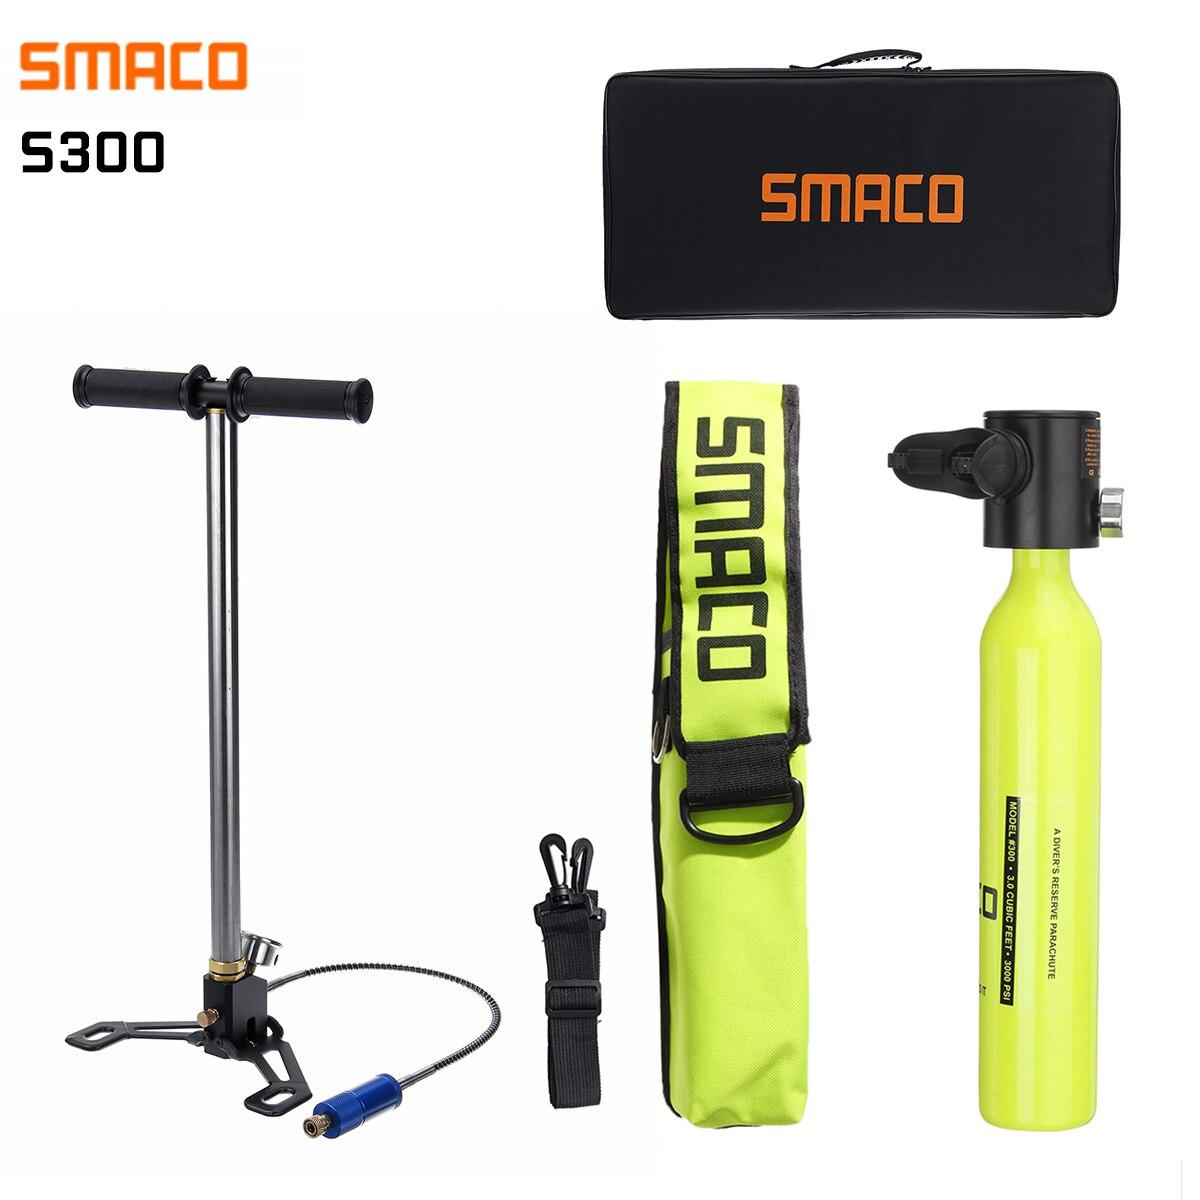 SMACO Diving System Mini Scuba Cylinder Scuba Oxygen Reserve Air Tank Pump Aluminum Box Snorkeling Diving Equipment Set